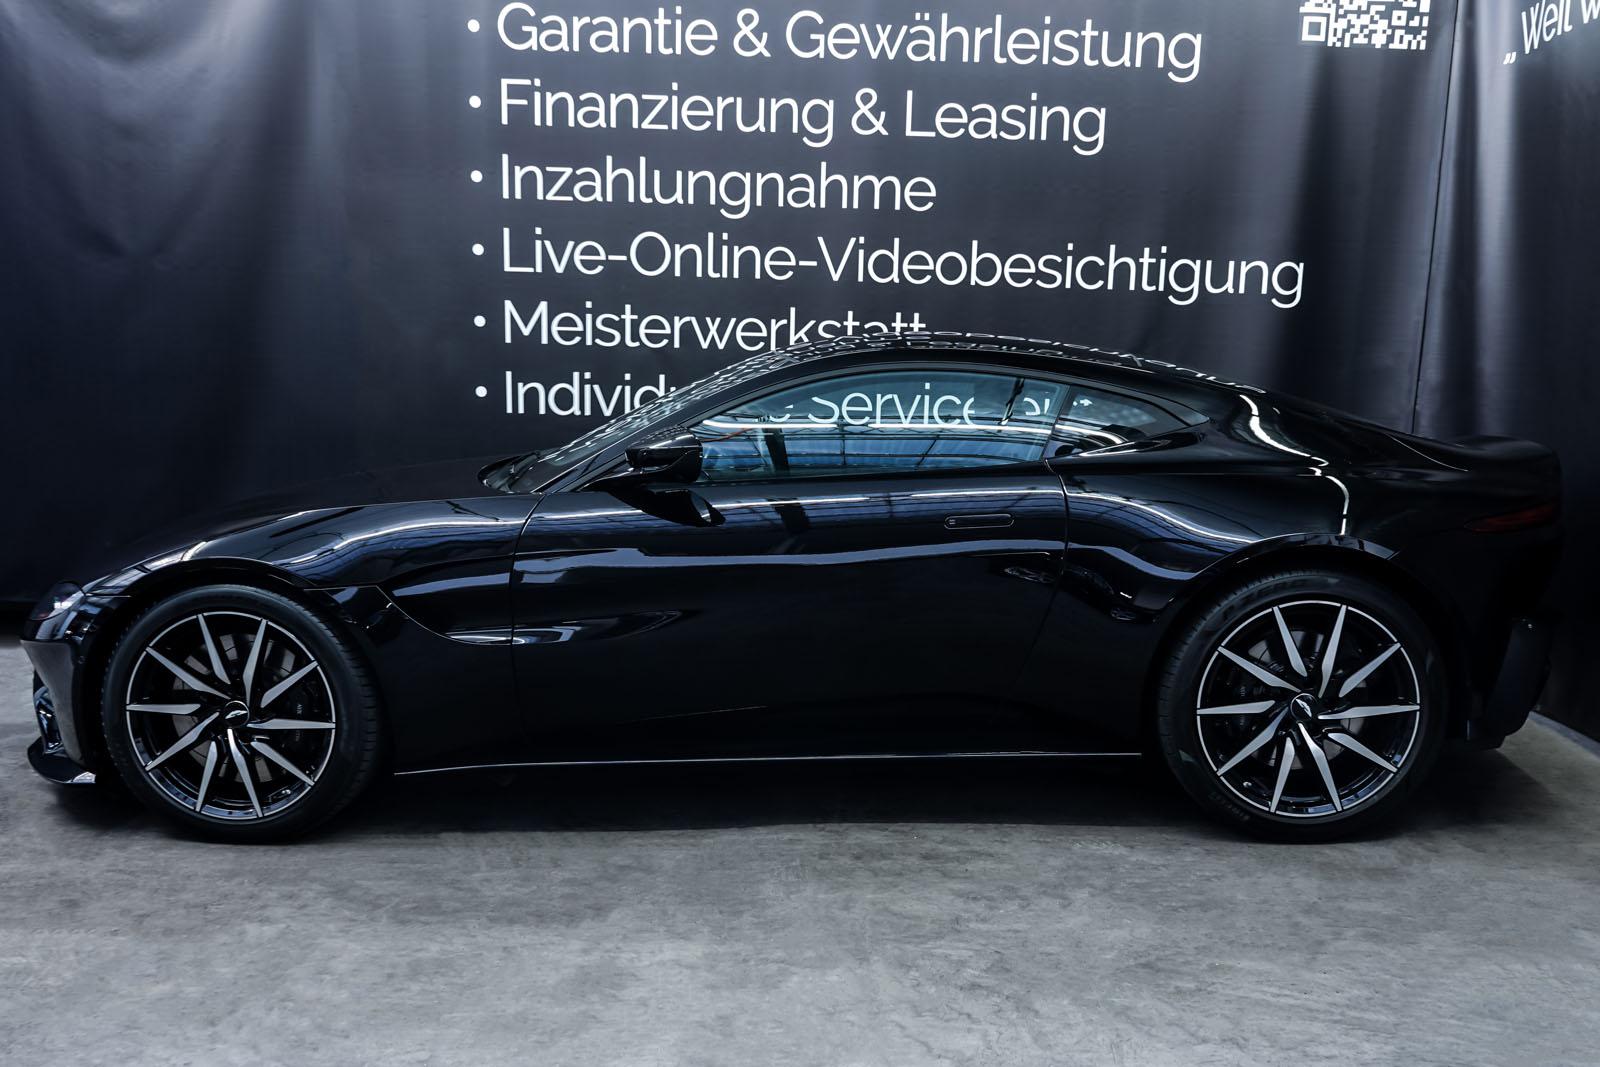 AstonMartin_V8_Vantage_Schwarz_Schwarz_AM-1849_5_w